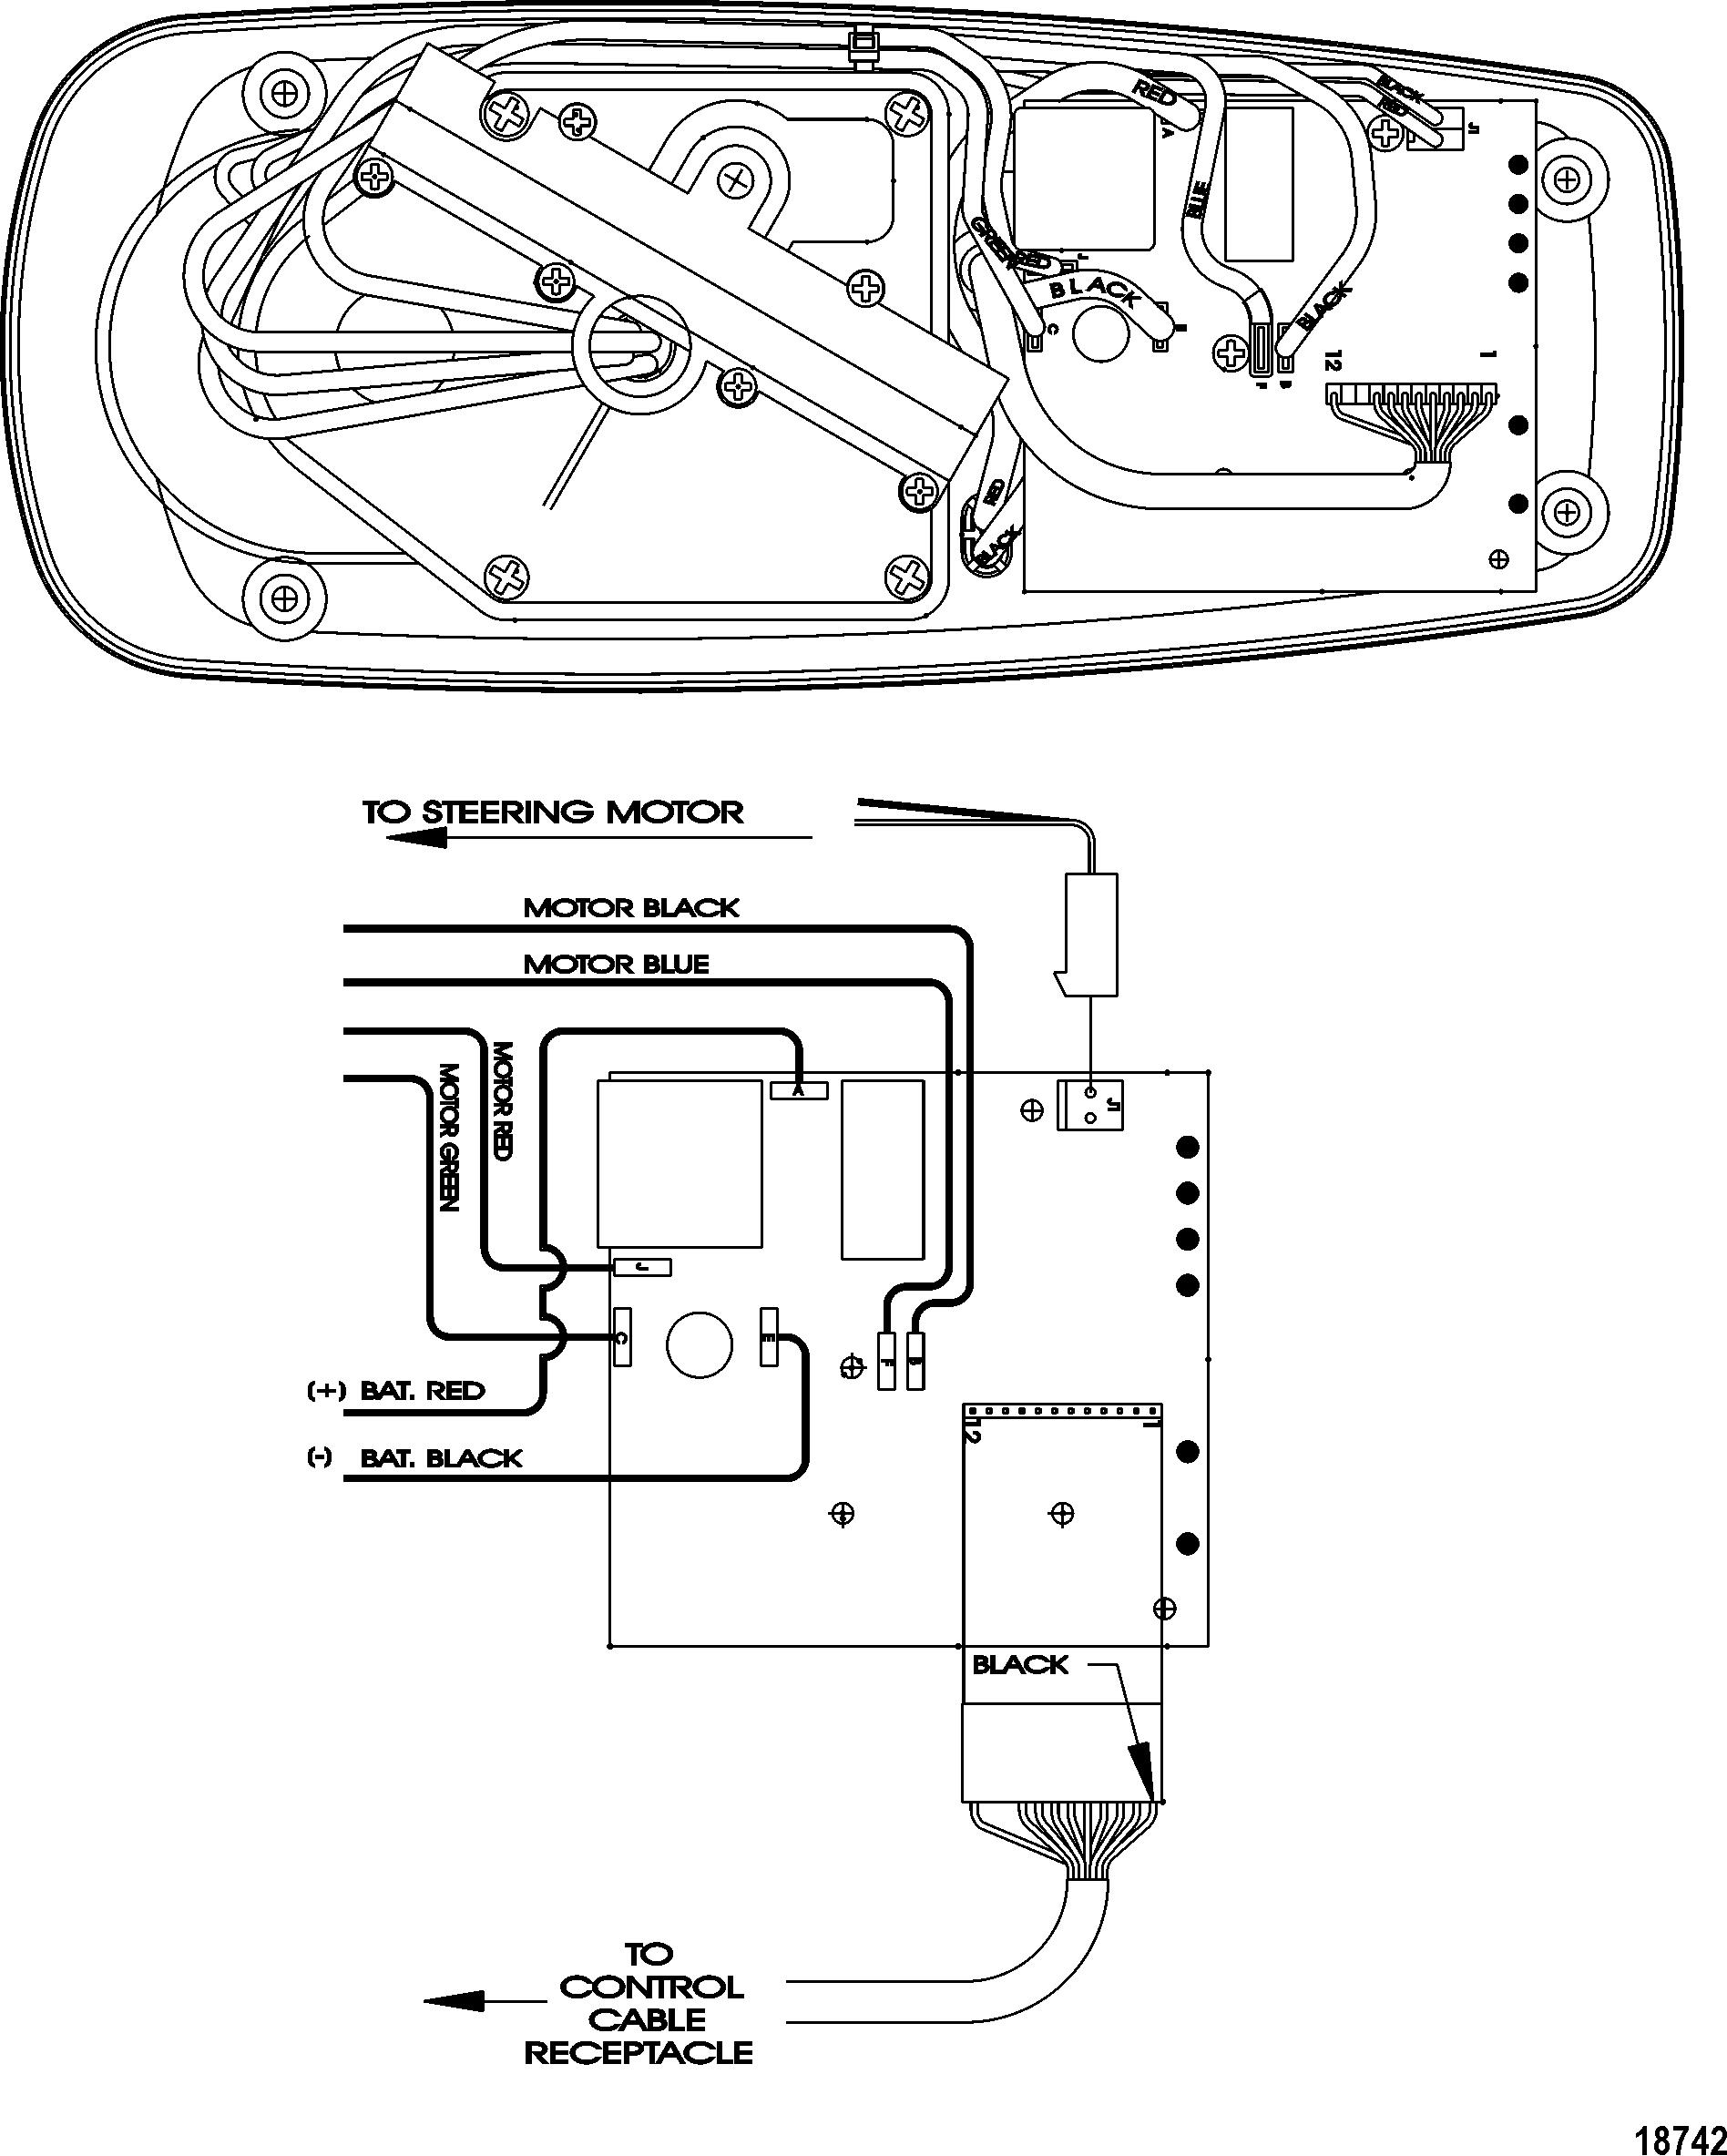 motorguide wiring diagram for household light switch mercury thruster trolling motor 46